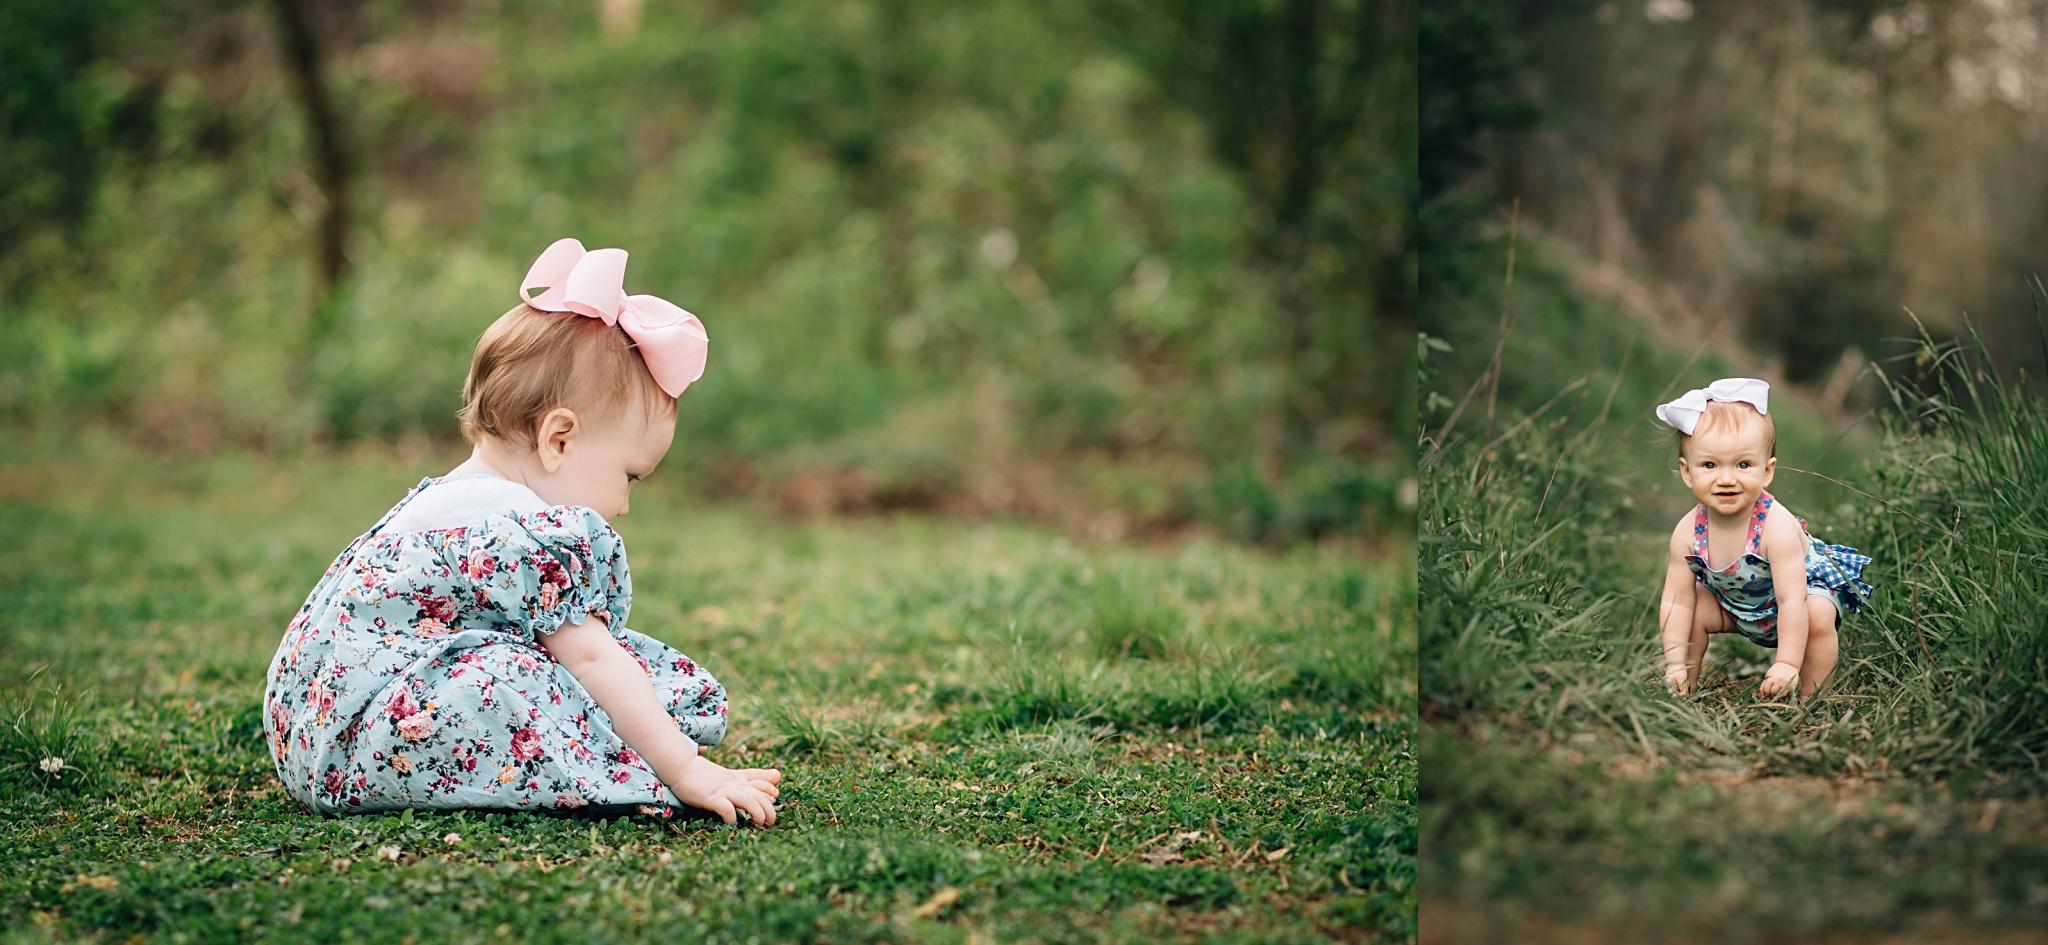 woodstock baby photographer-4.jpg